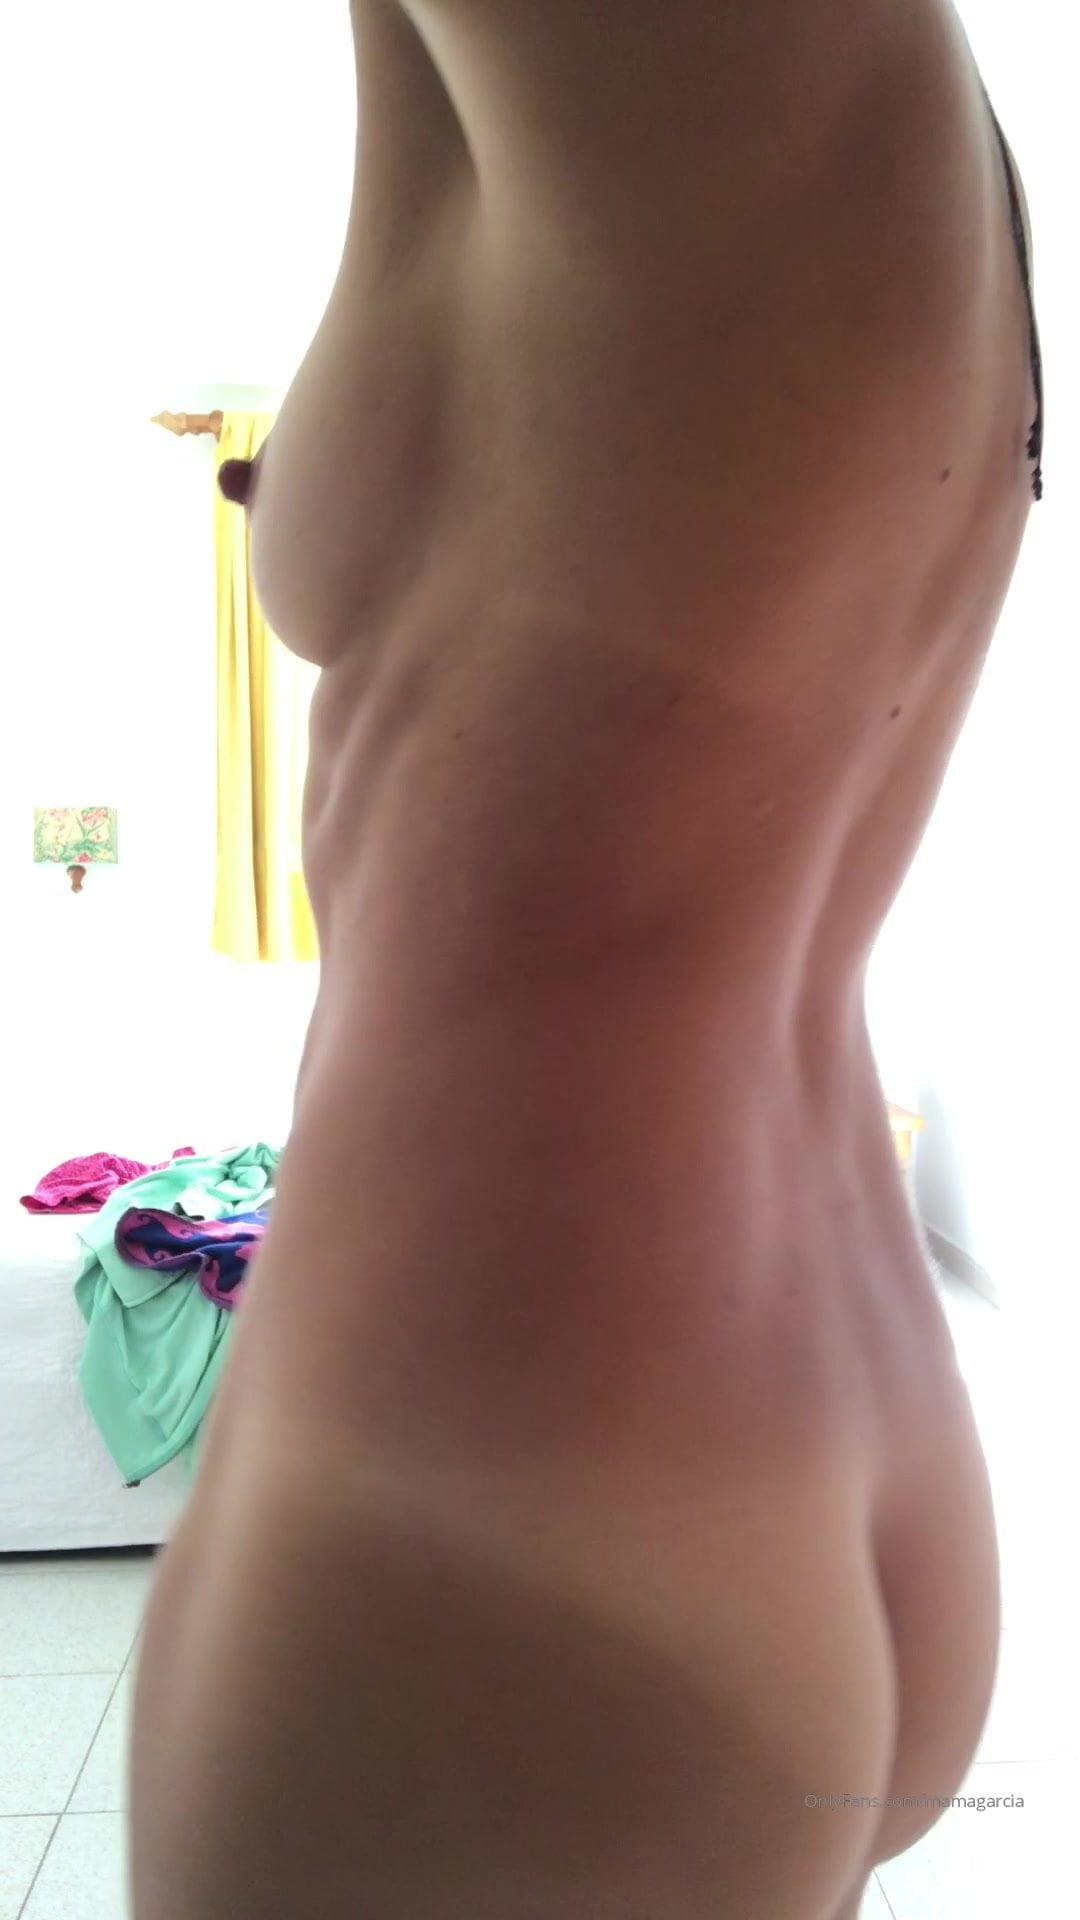 Ana Garcia Porno ana garcia starting to the week with a dance: free porn 7e